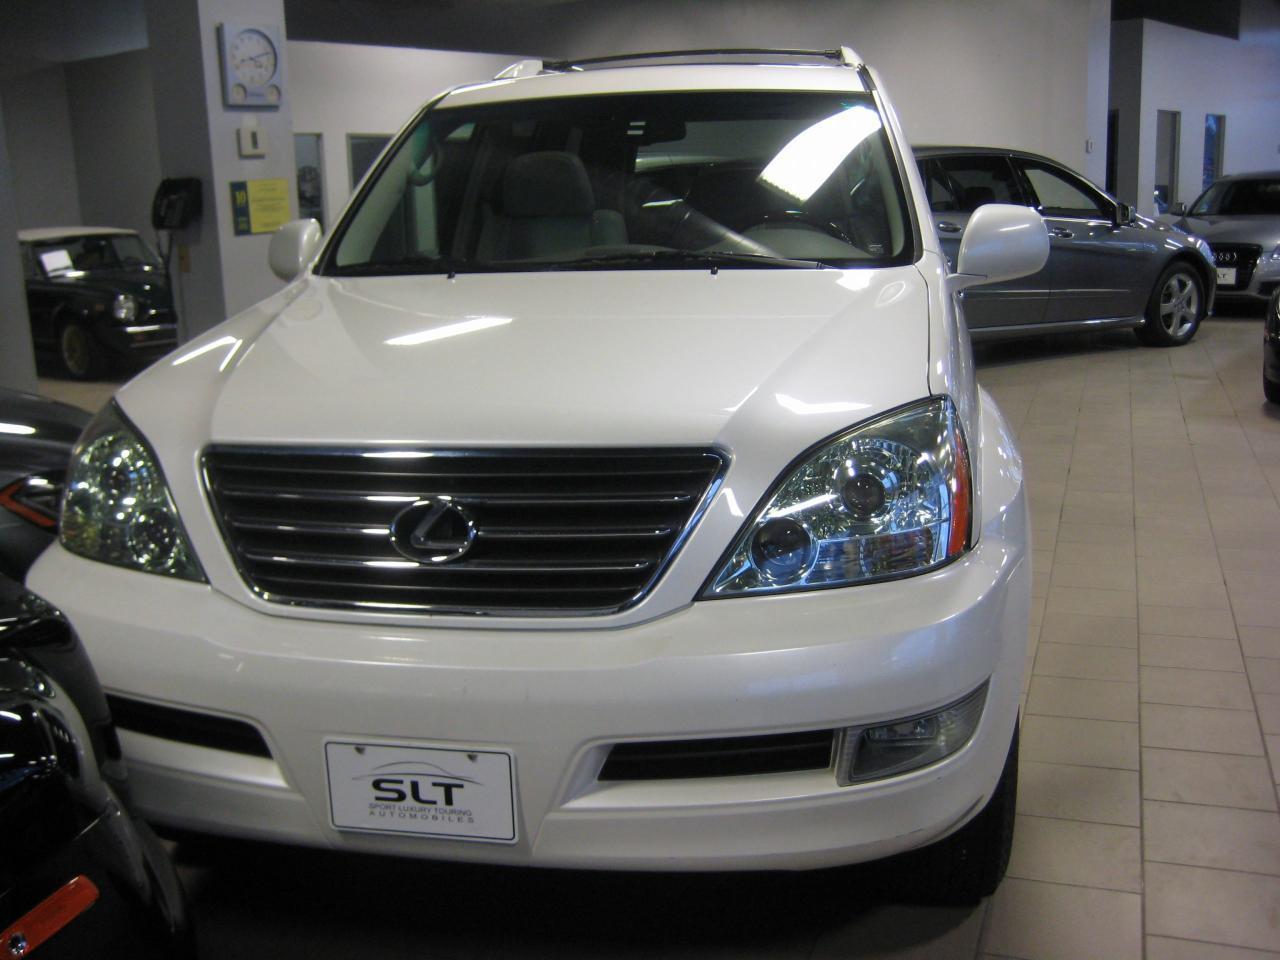 2008 Lexus GX 470 4WD